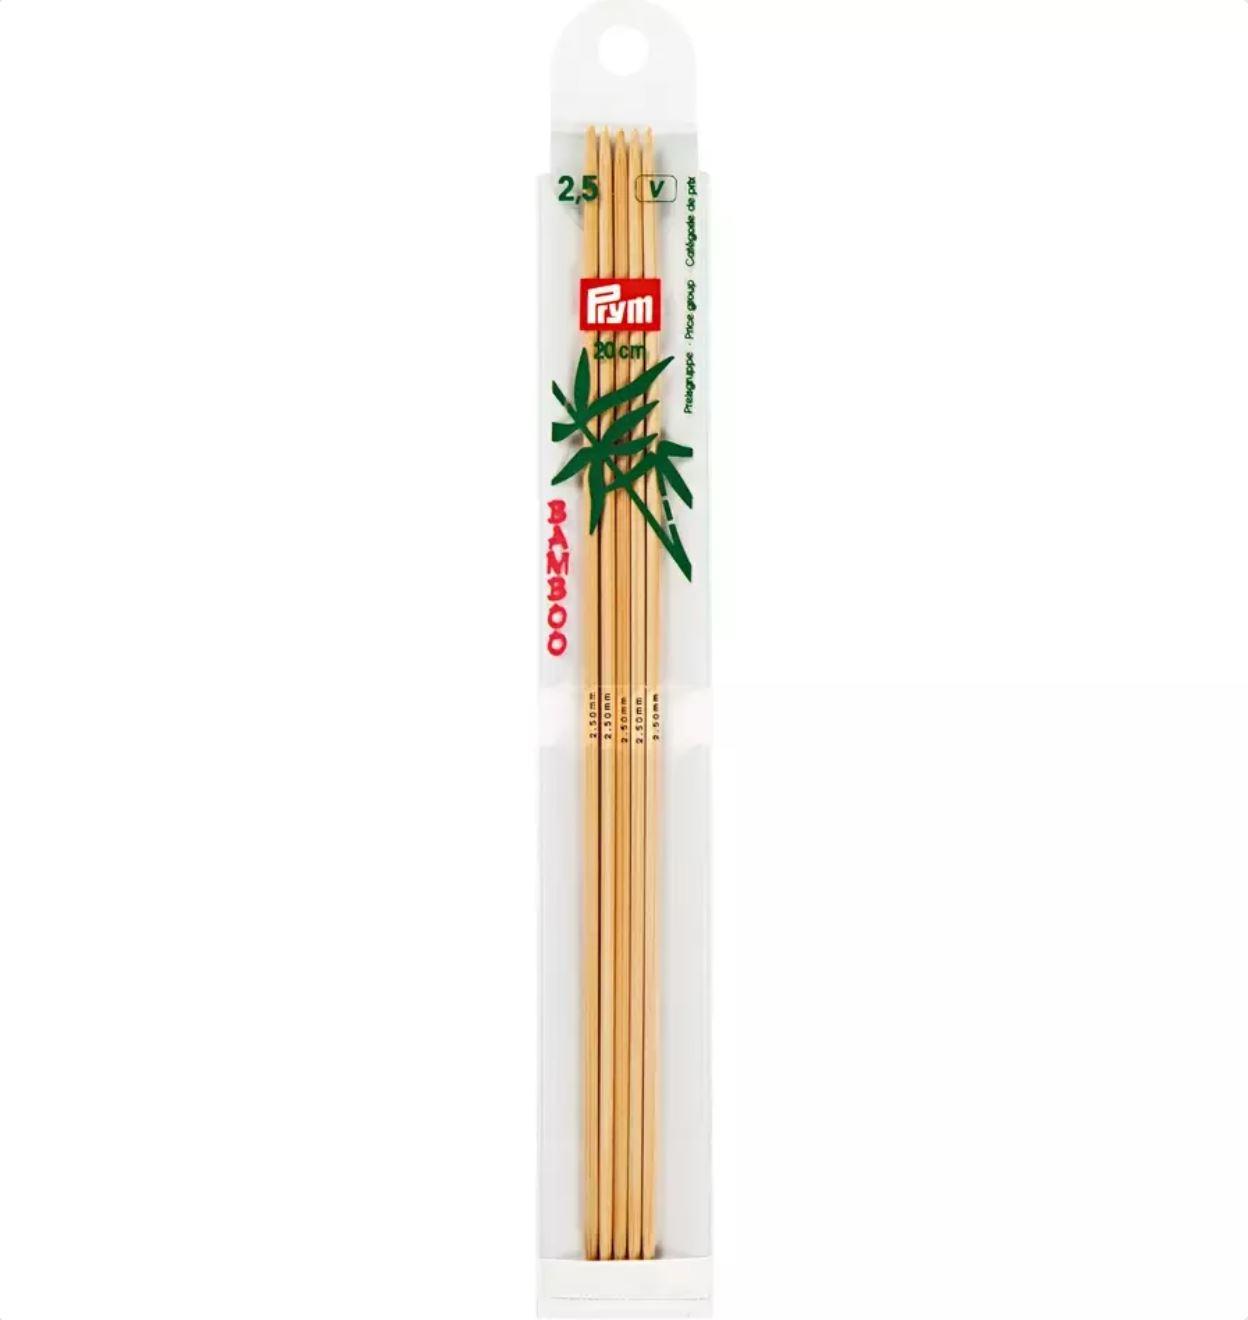 Prym Bamboo Settpinne 5stk - Bambus - 2,5 - 20cm